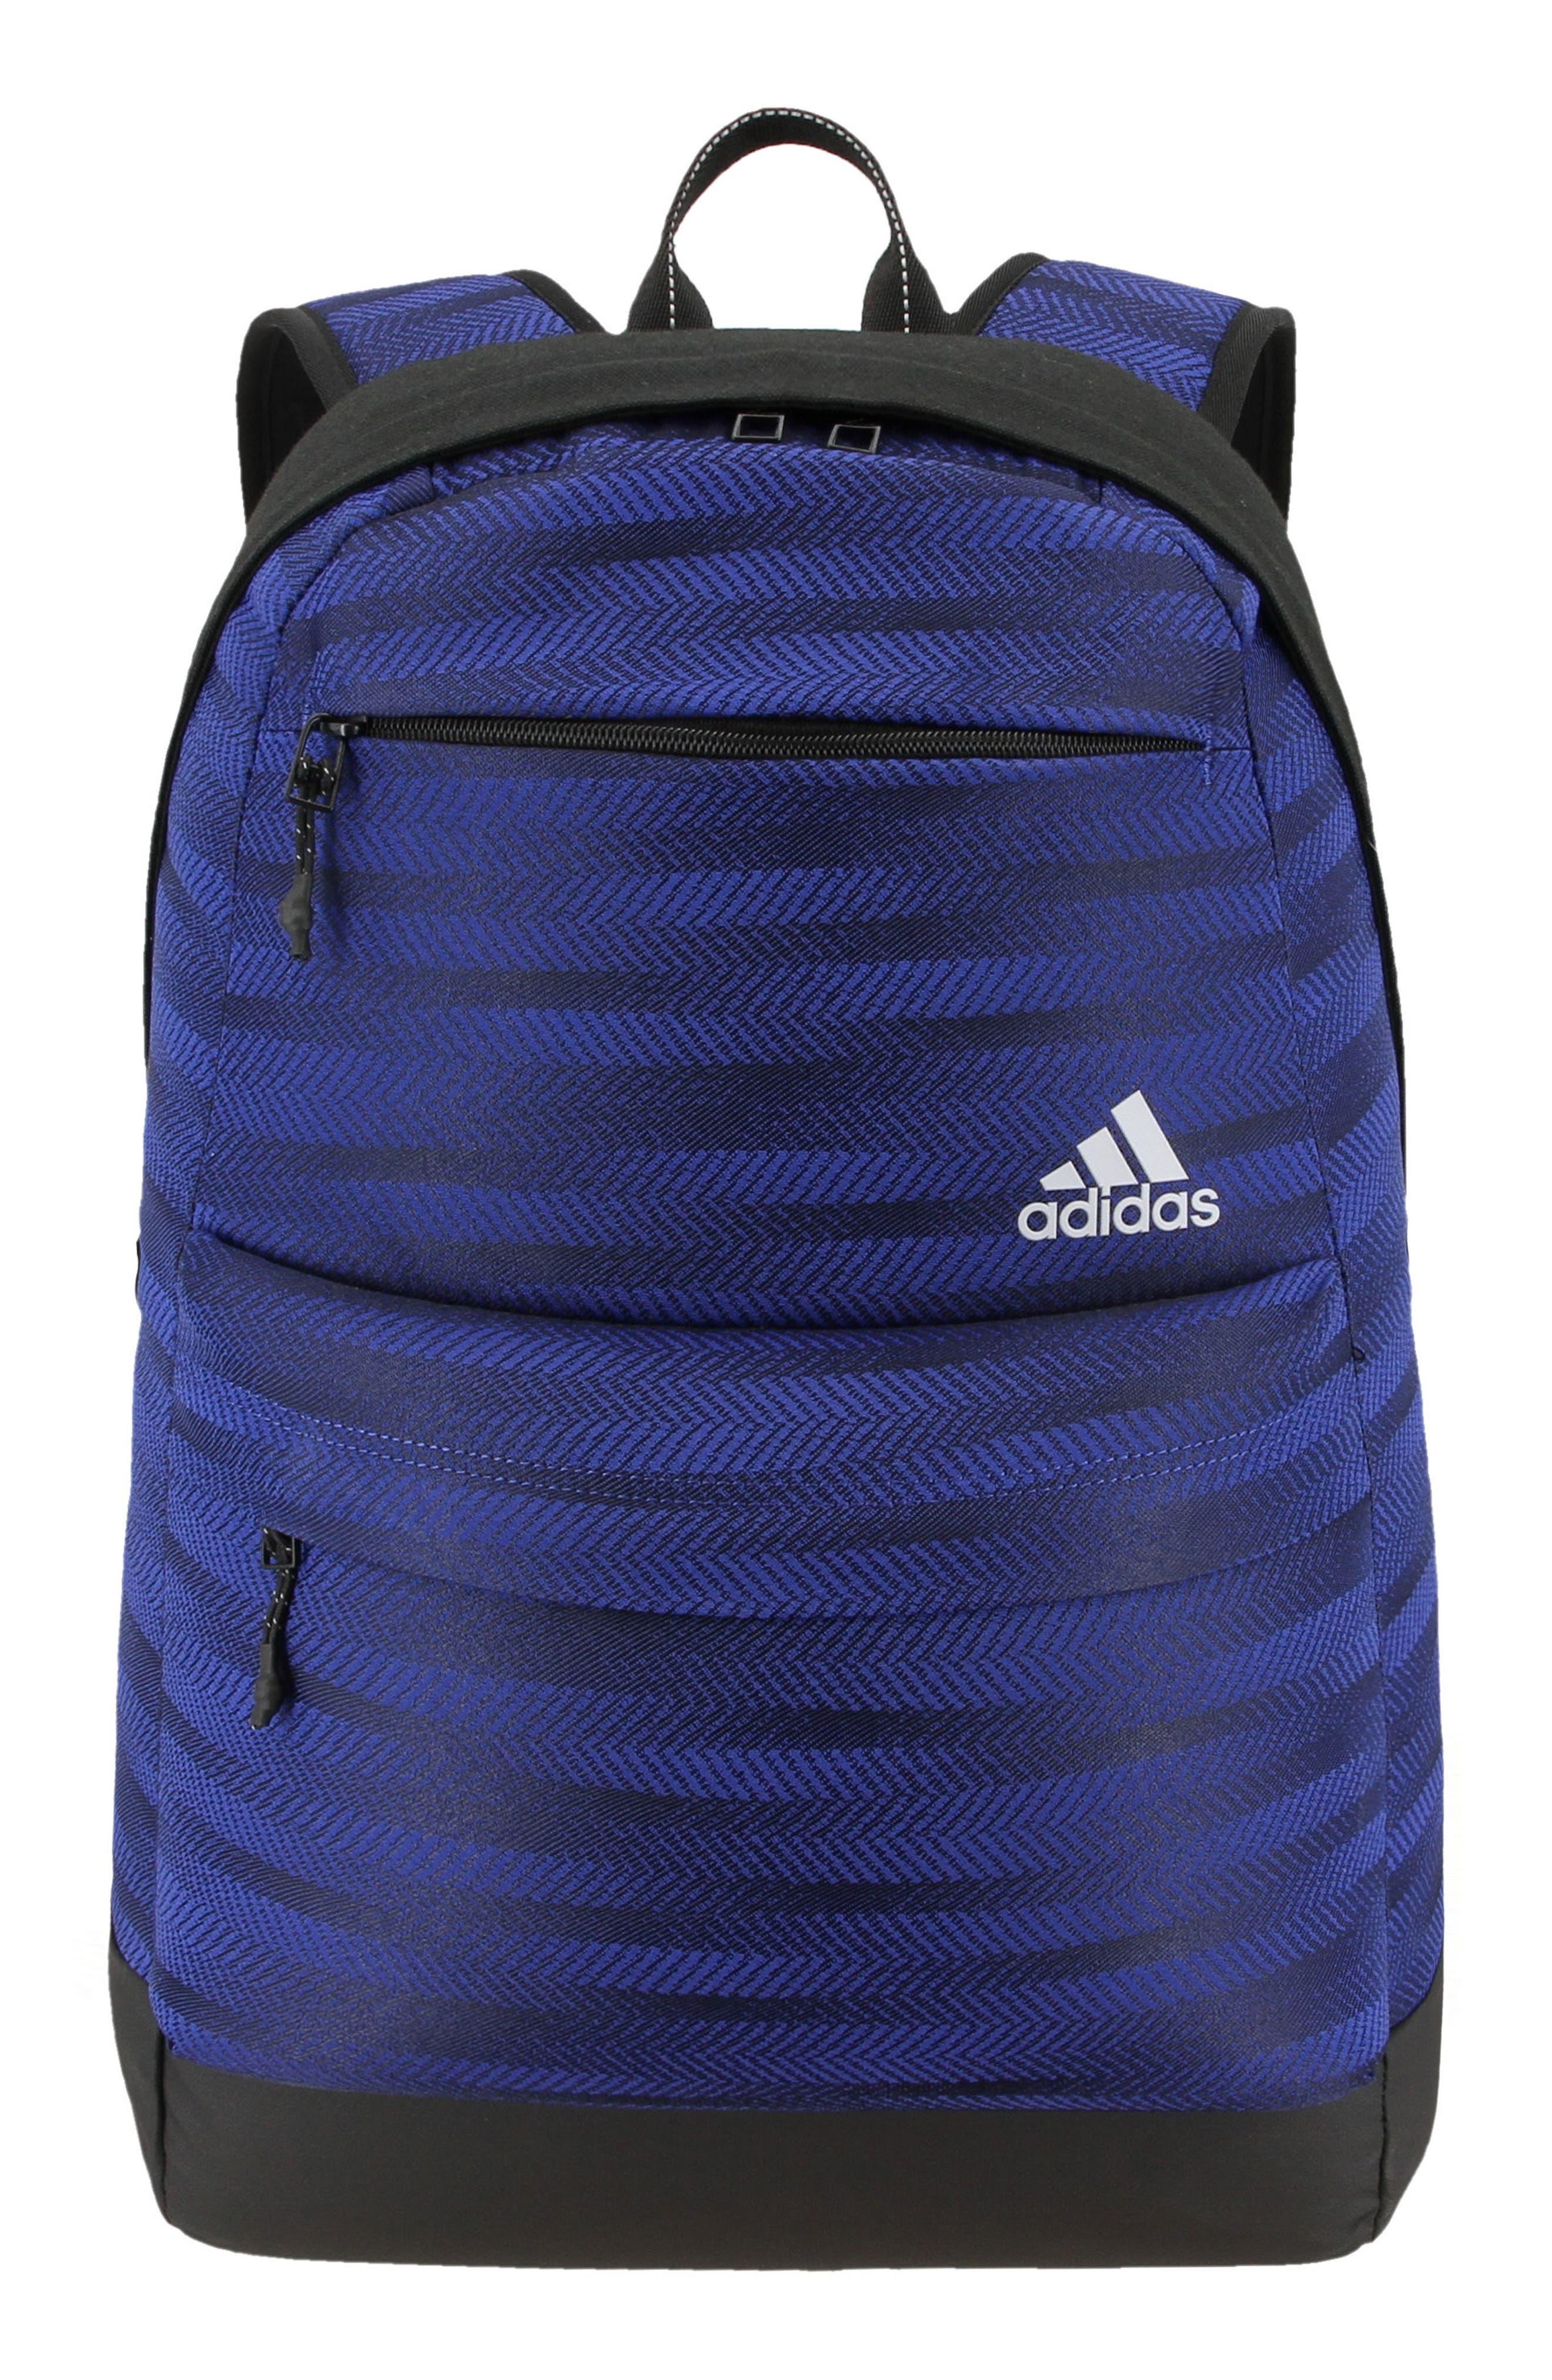 adidas Originals Daybreak Backpack